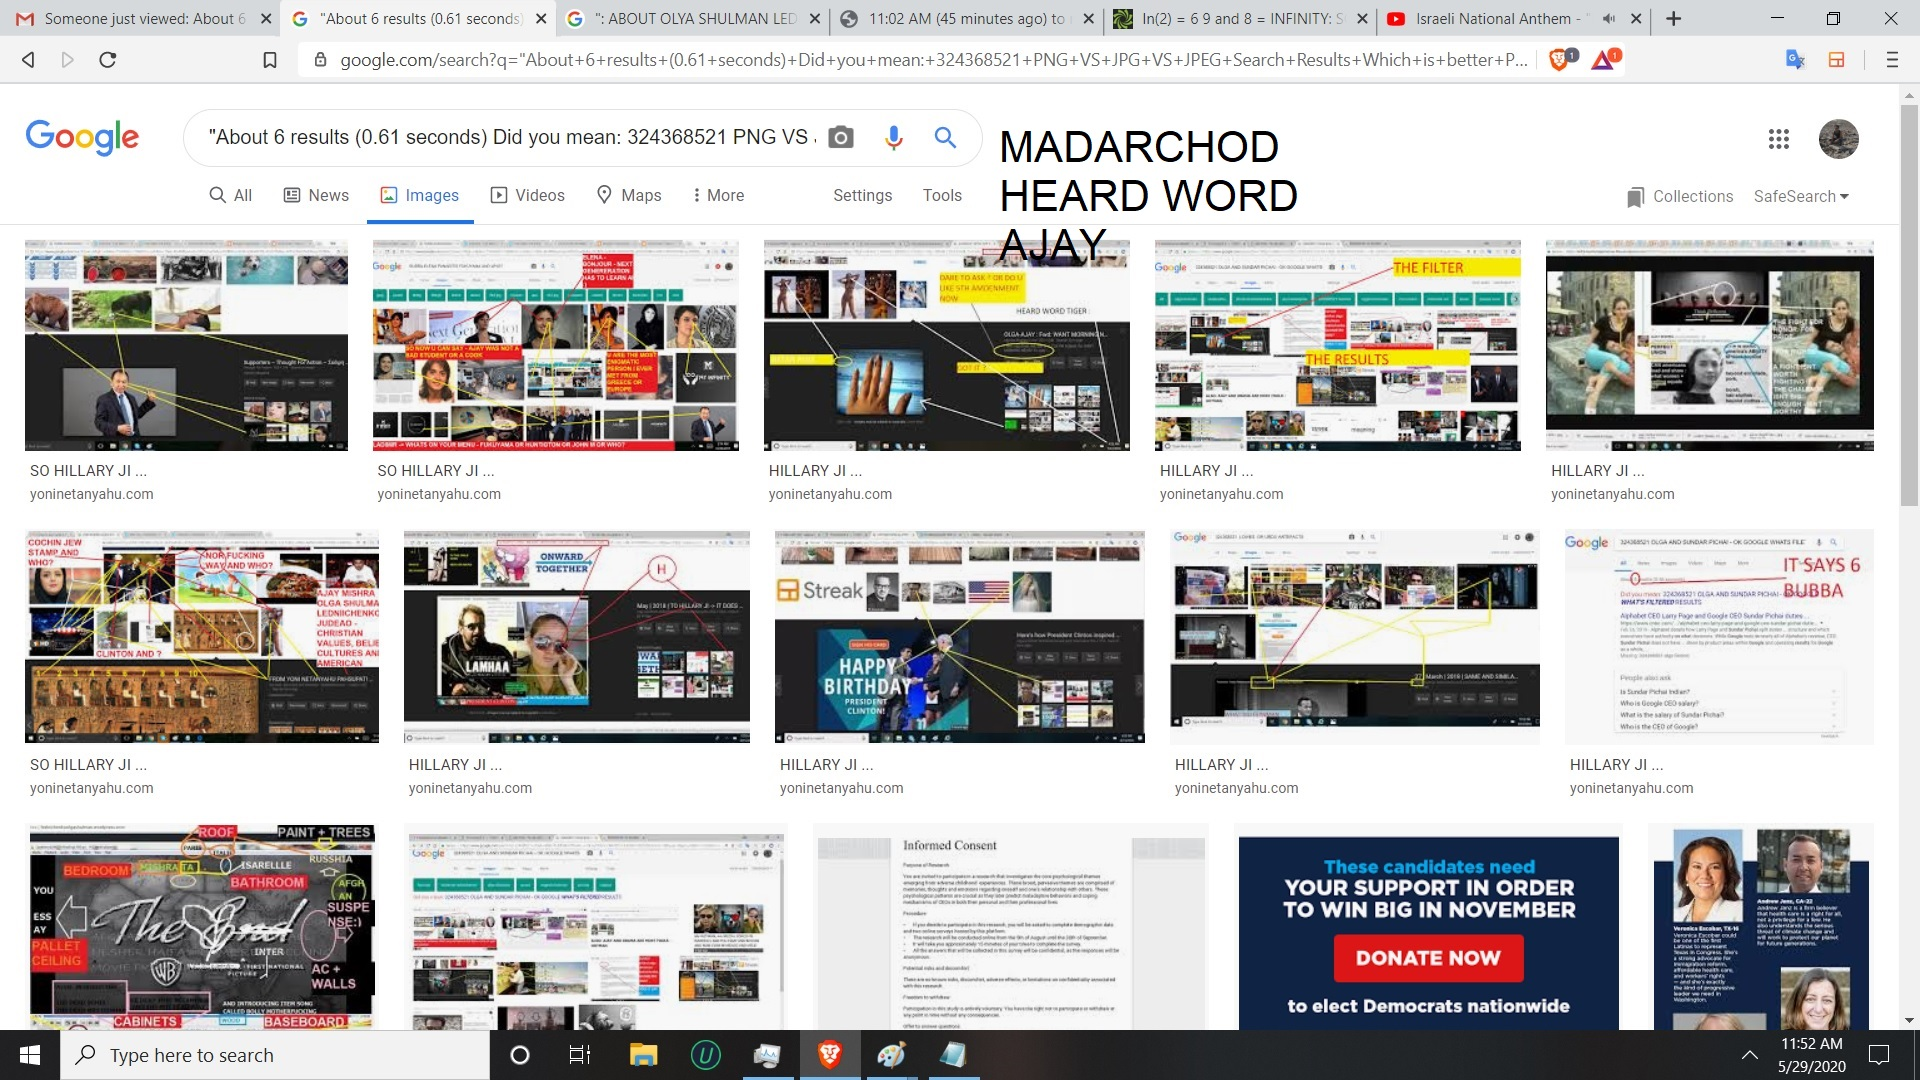 MADARCHOD HEARD WORD AJAY